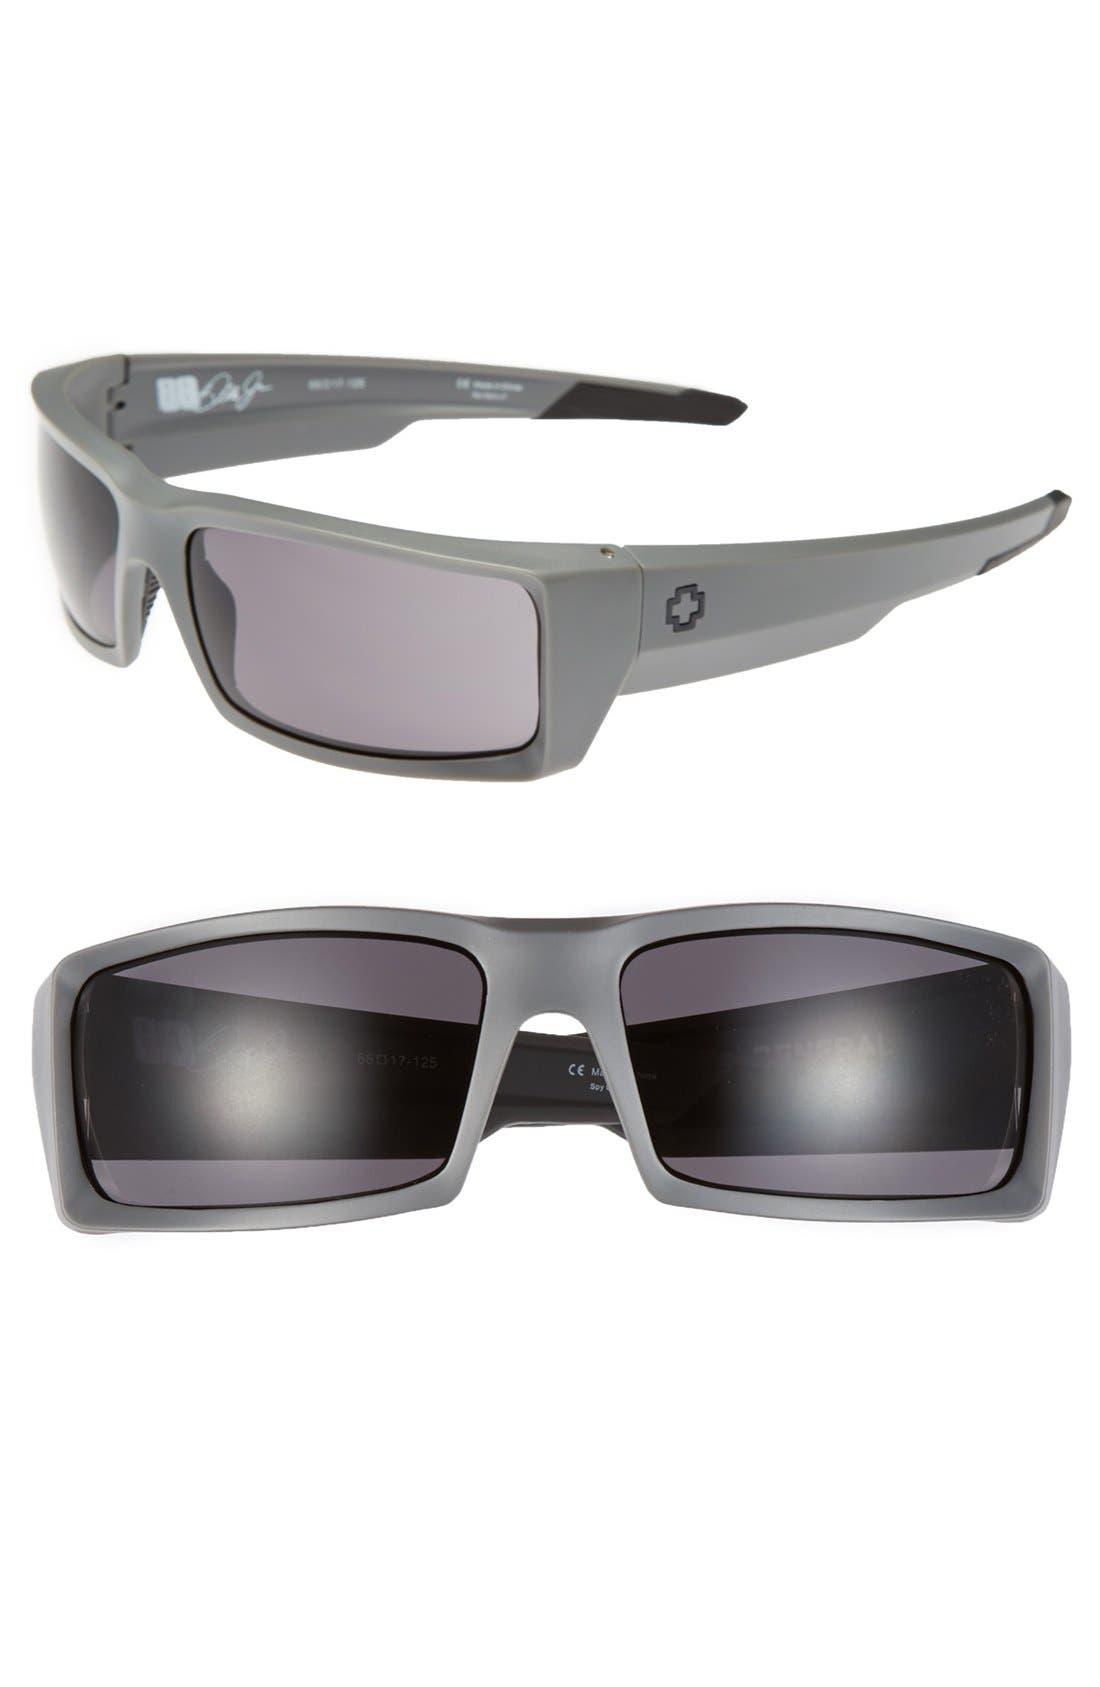 Main Image - SPY Optic 'Dale Earnhardt Jr. - General' 66mm Sunglasses